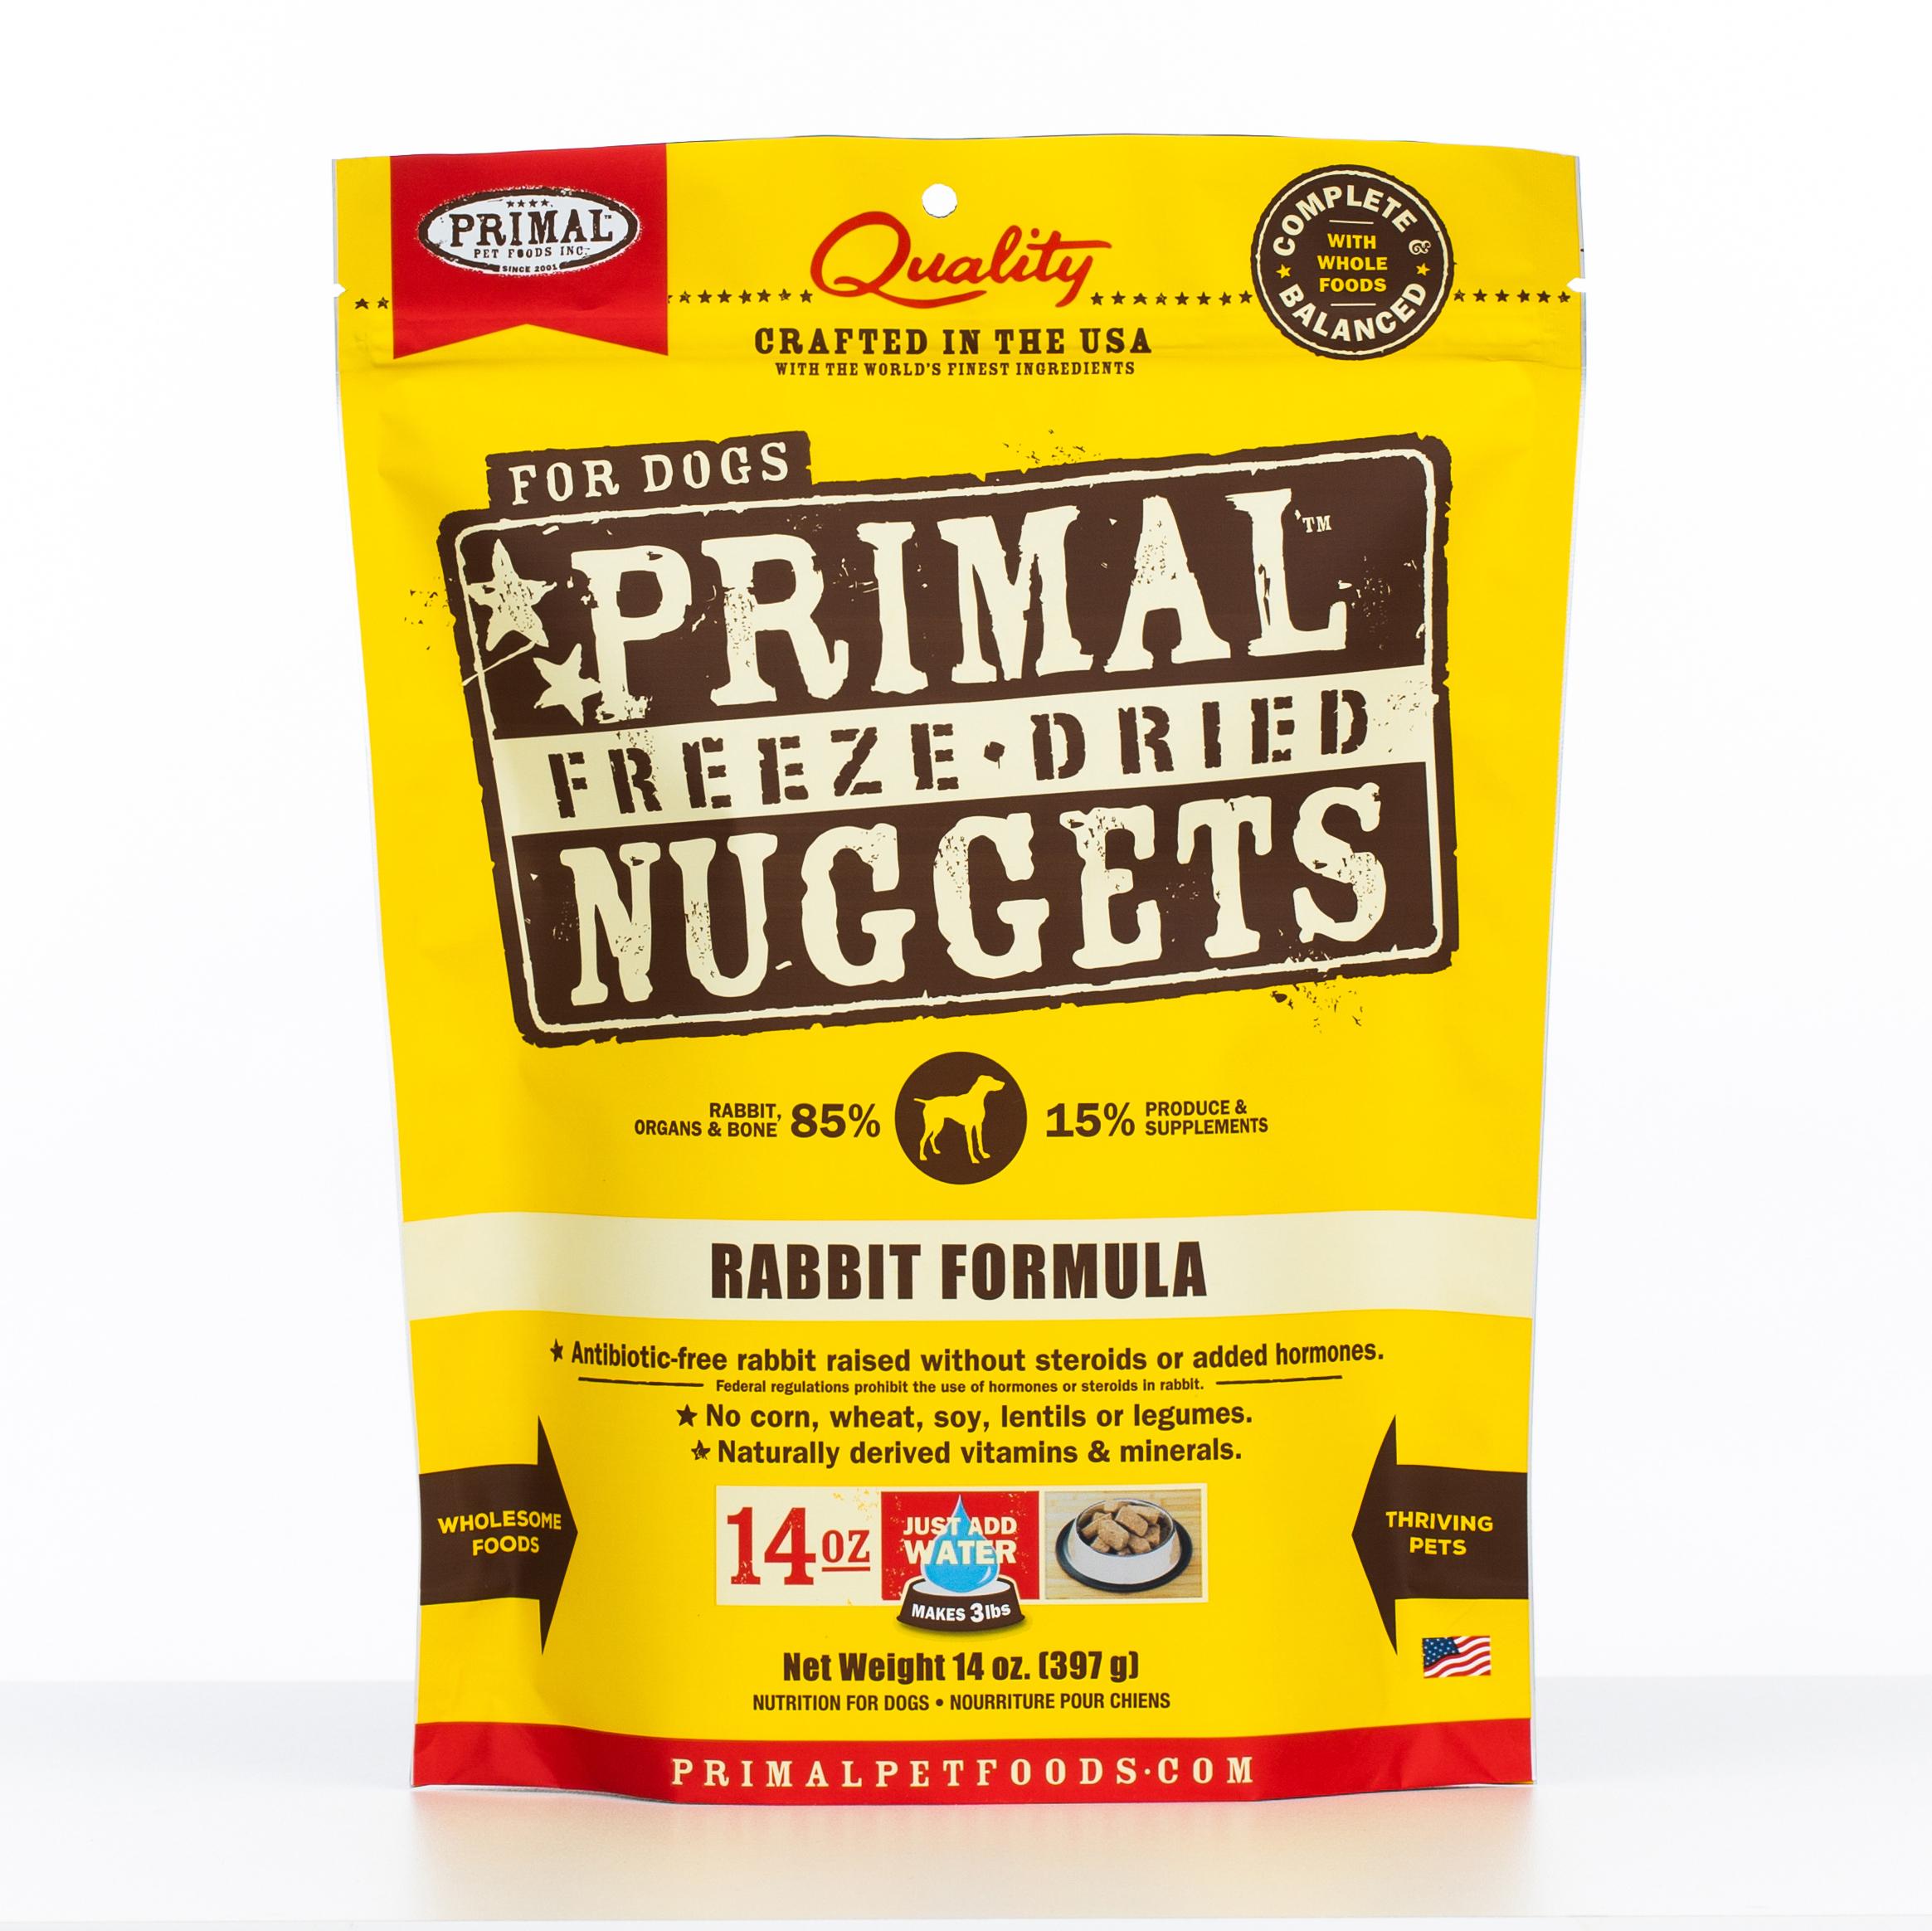 Primal Raw Freeze-Dried Nuggets Rabbit Formula Dog Food, 14-oz bag